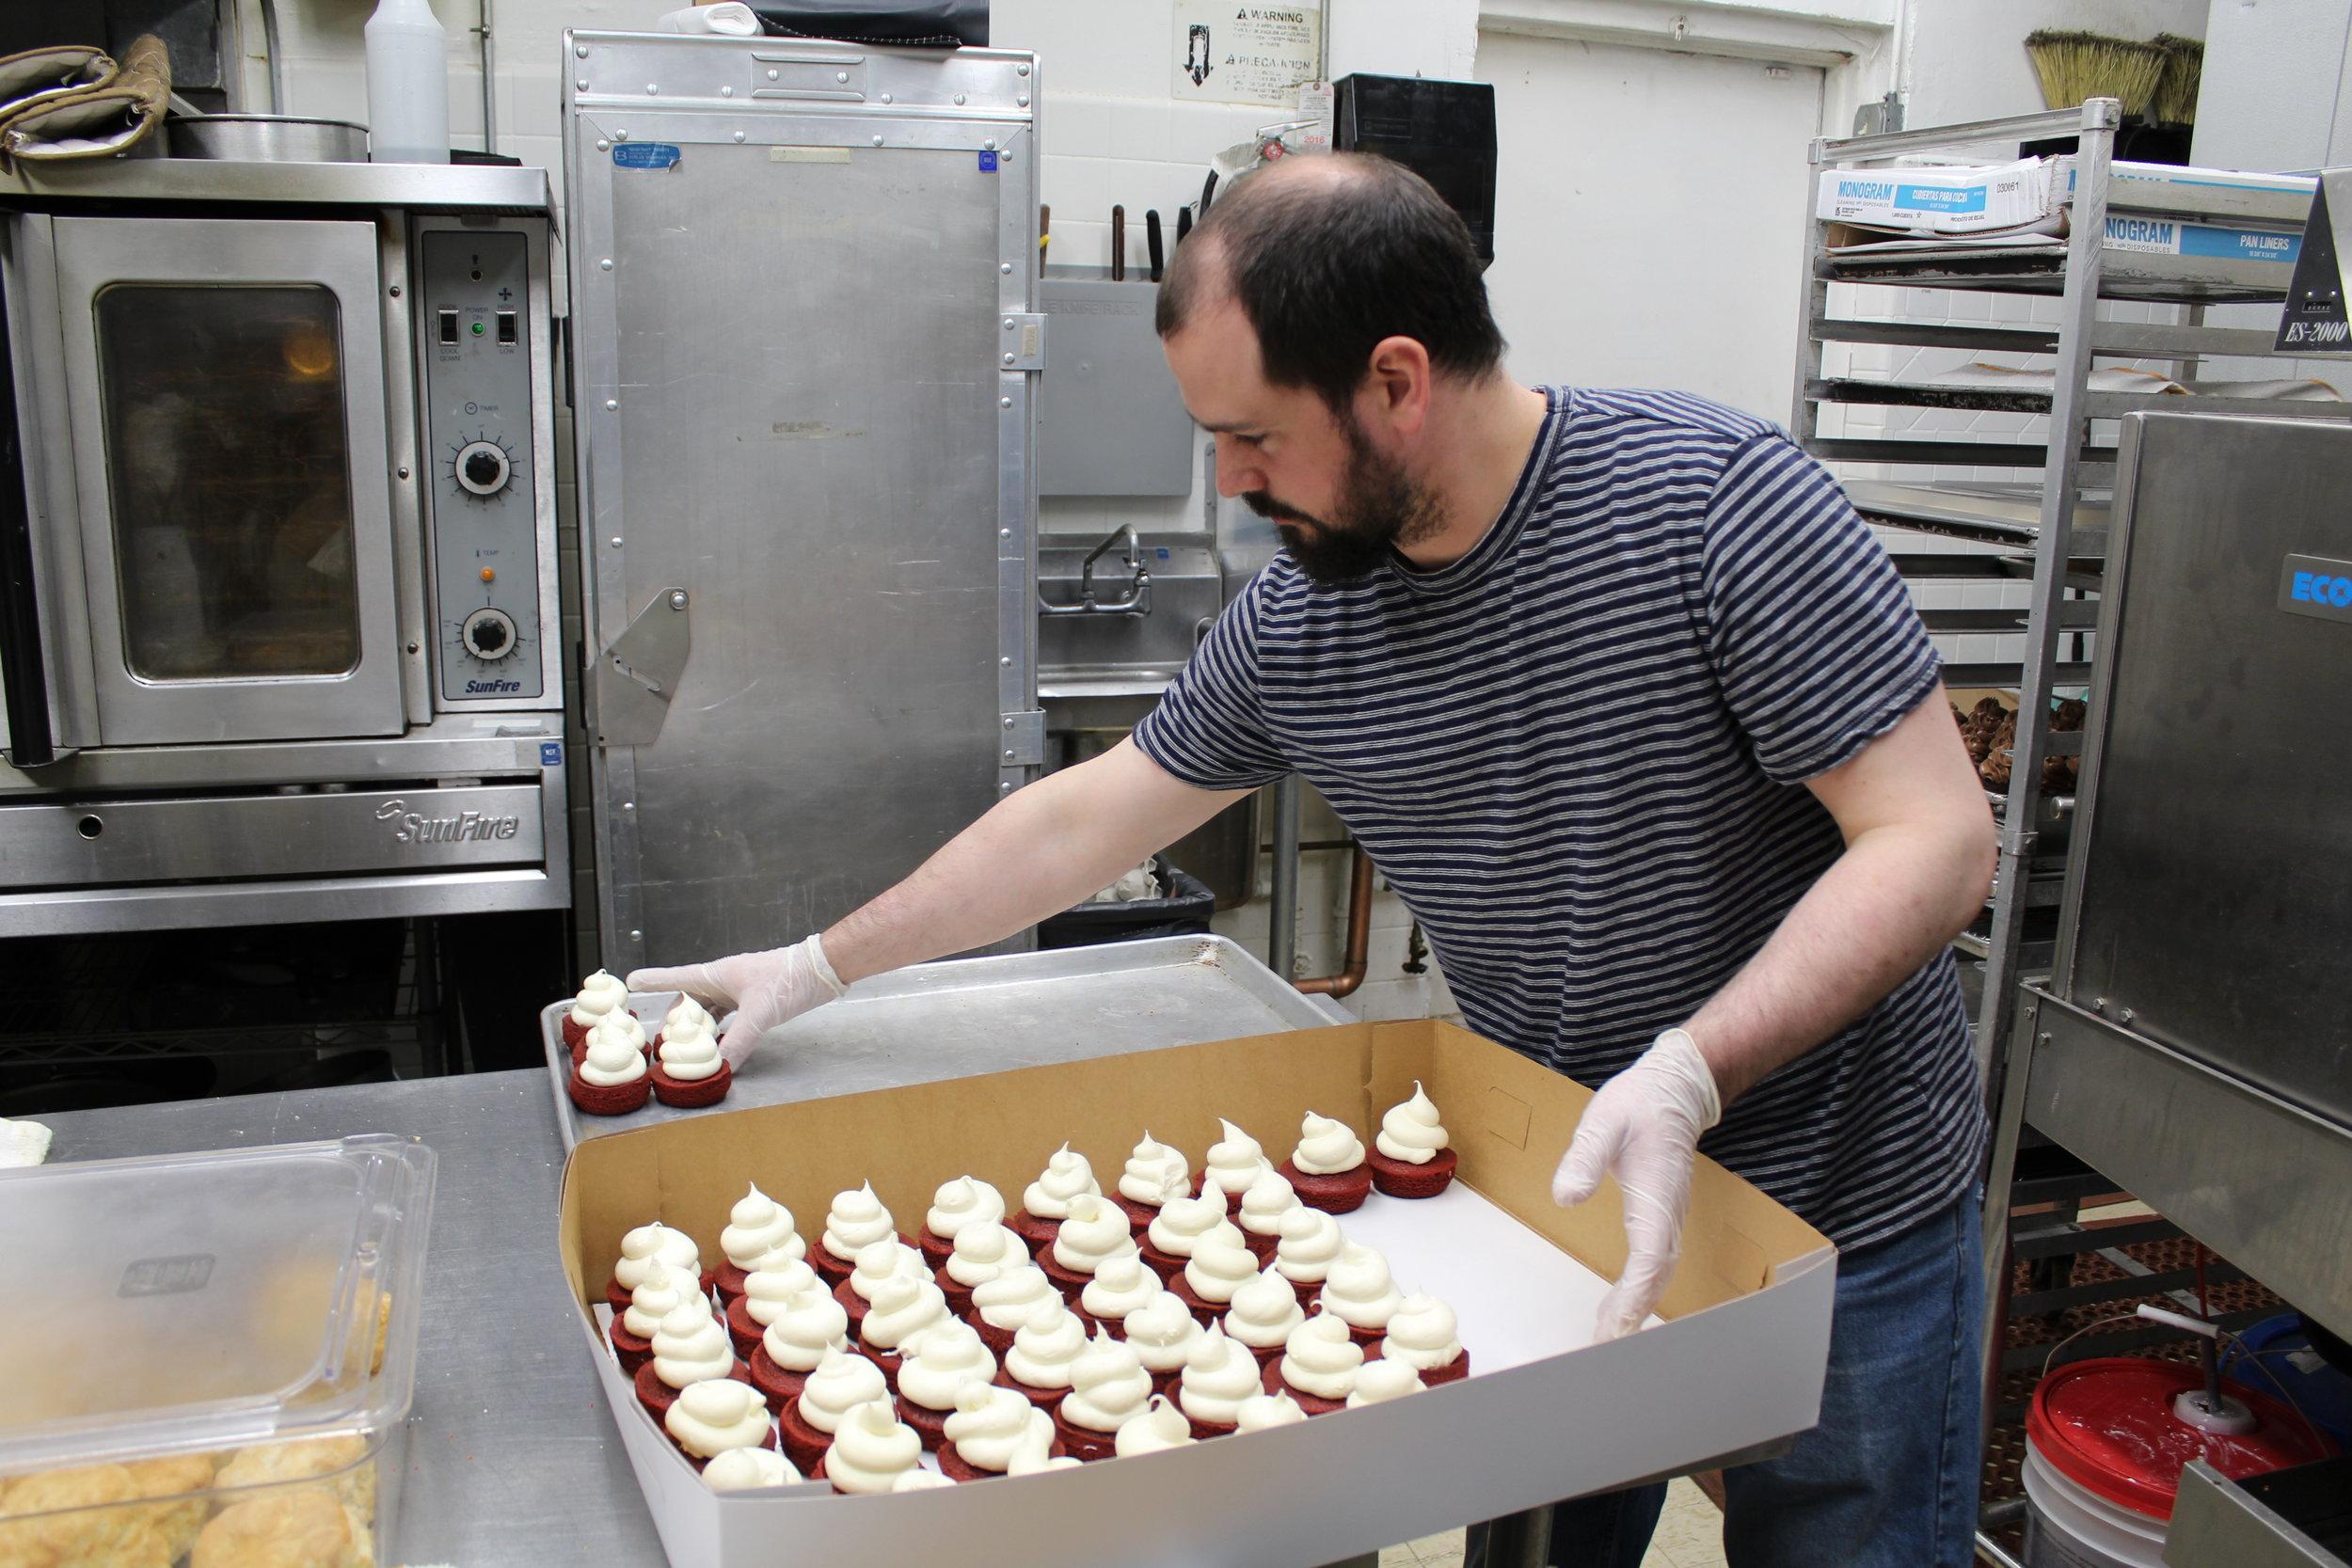 Owner Tim Benedict preparing cupcakes for donation